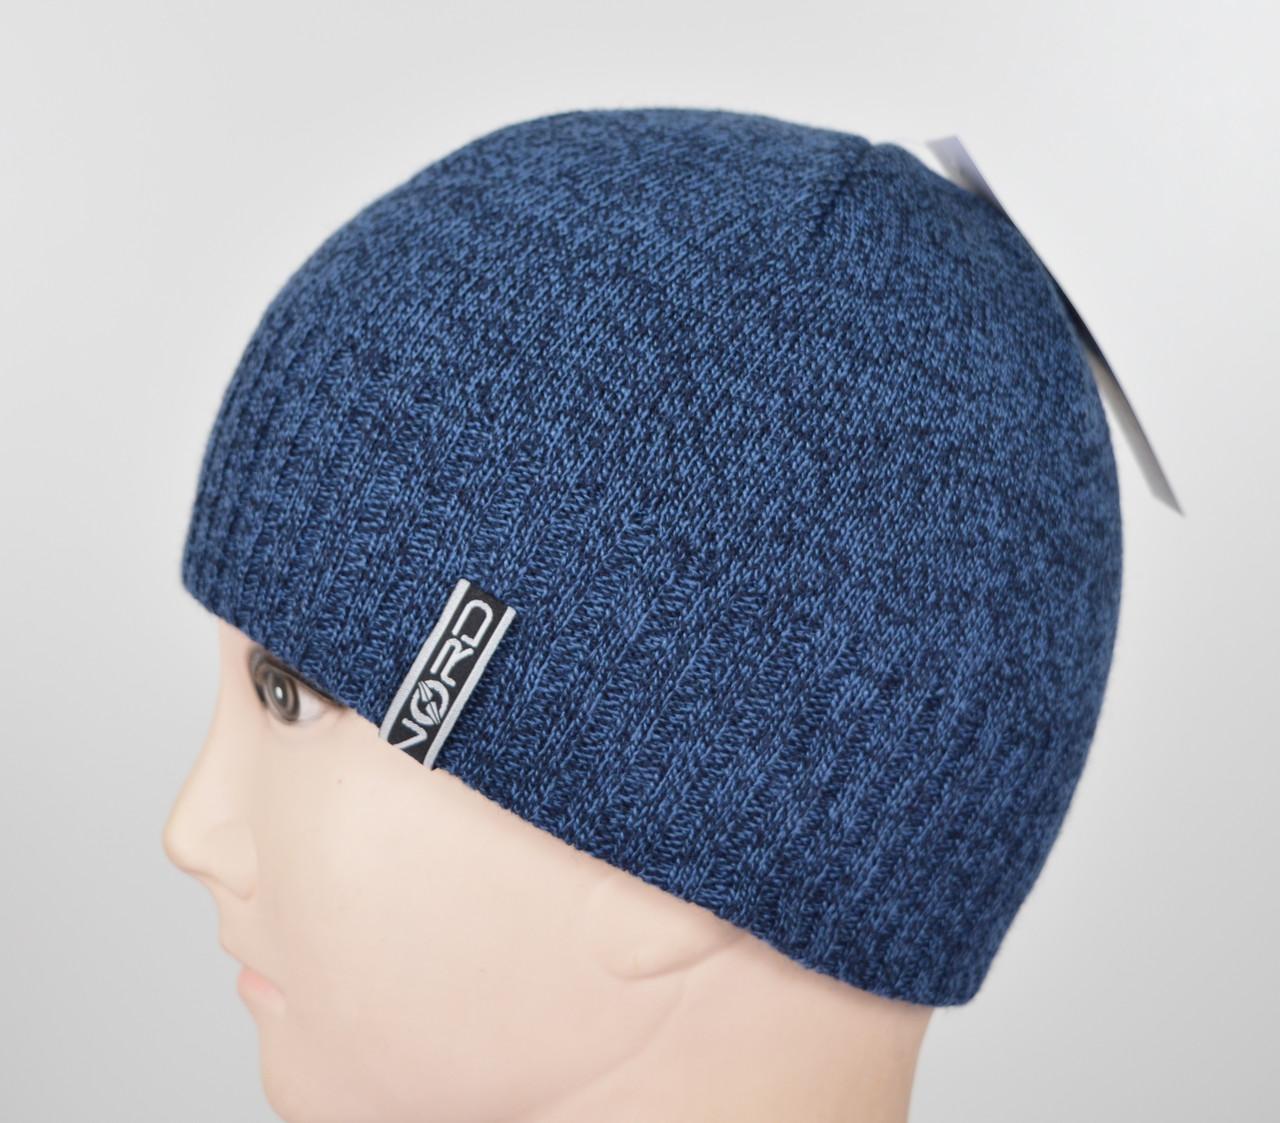 Мужская шапка Nord S-1801 джинс